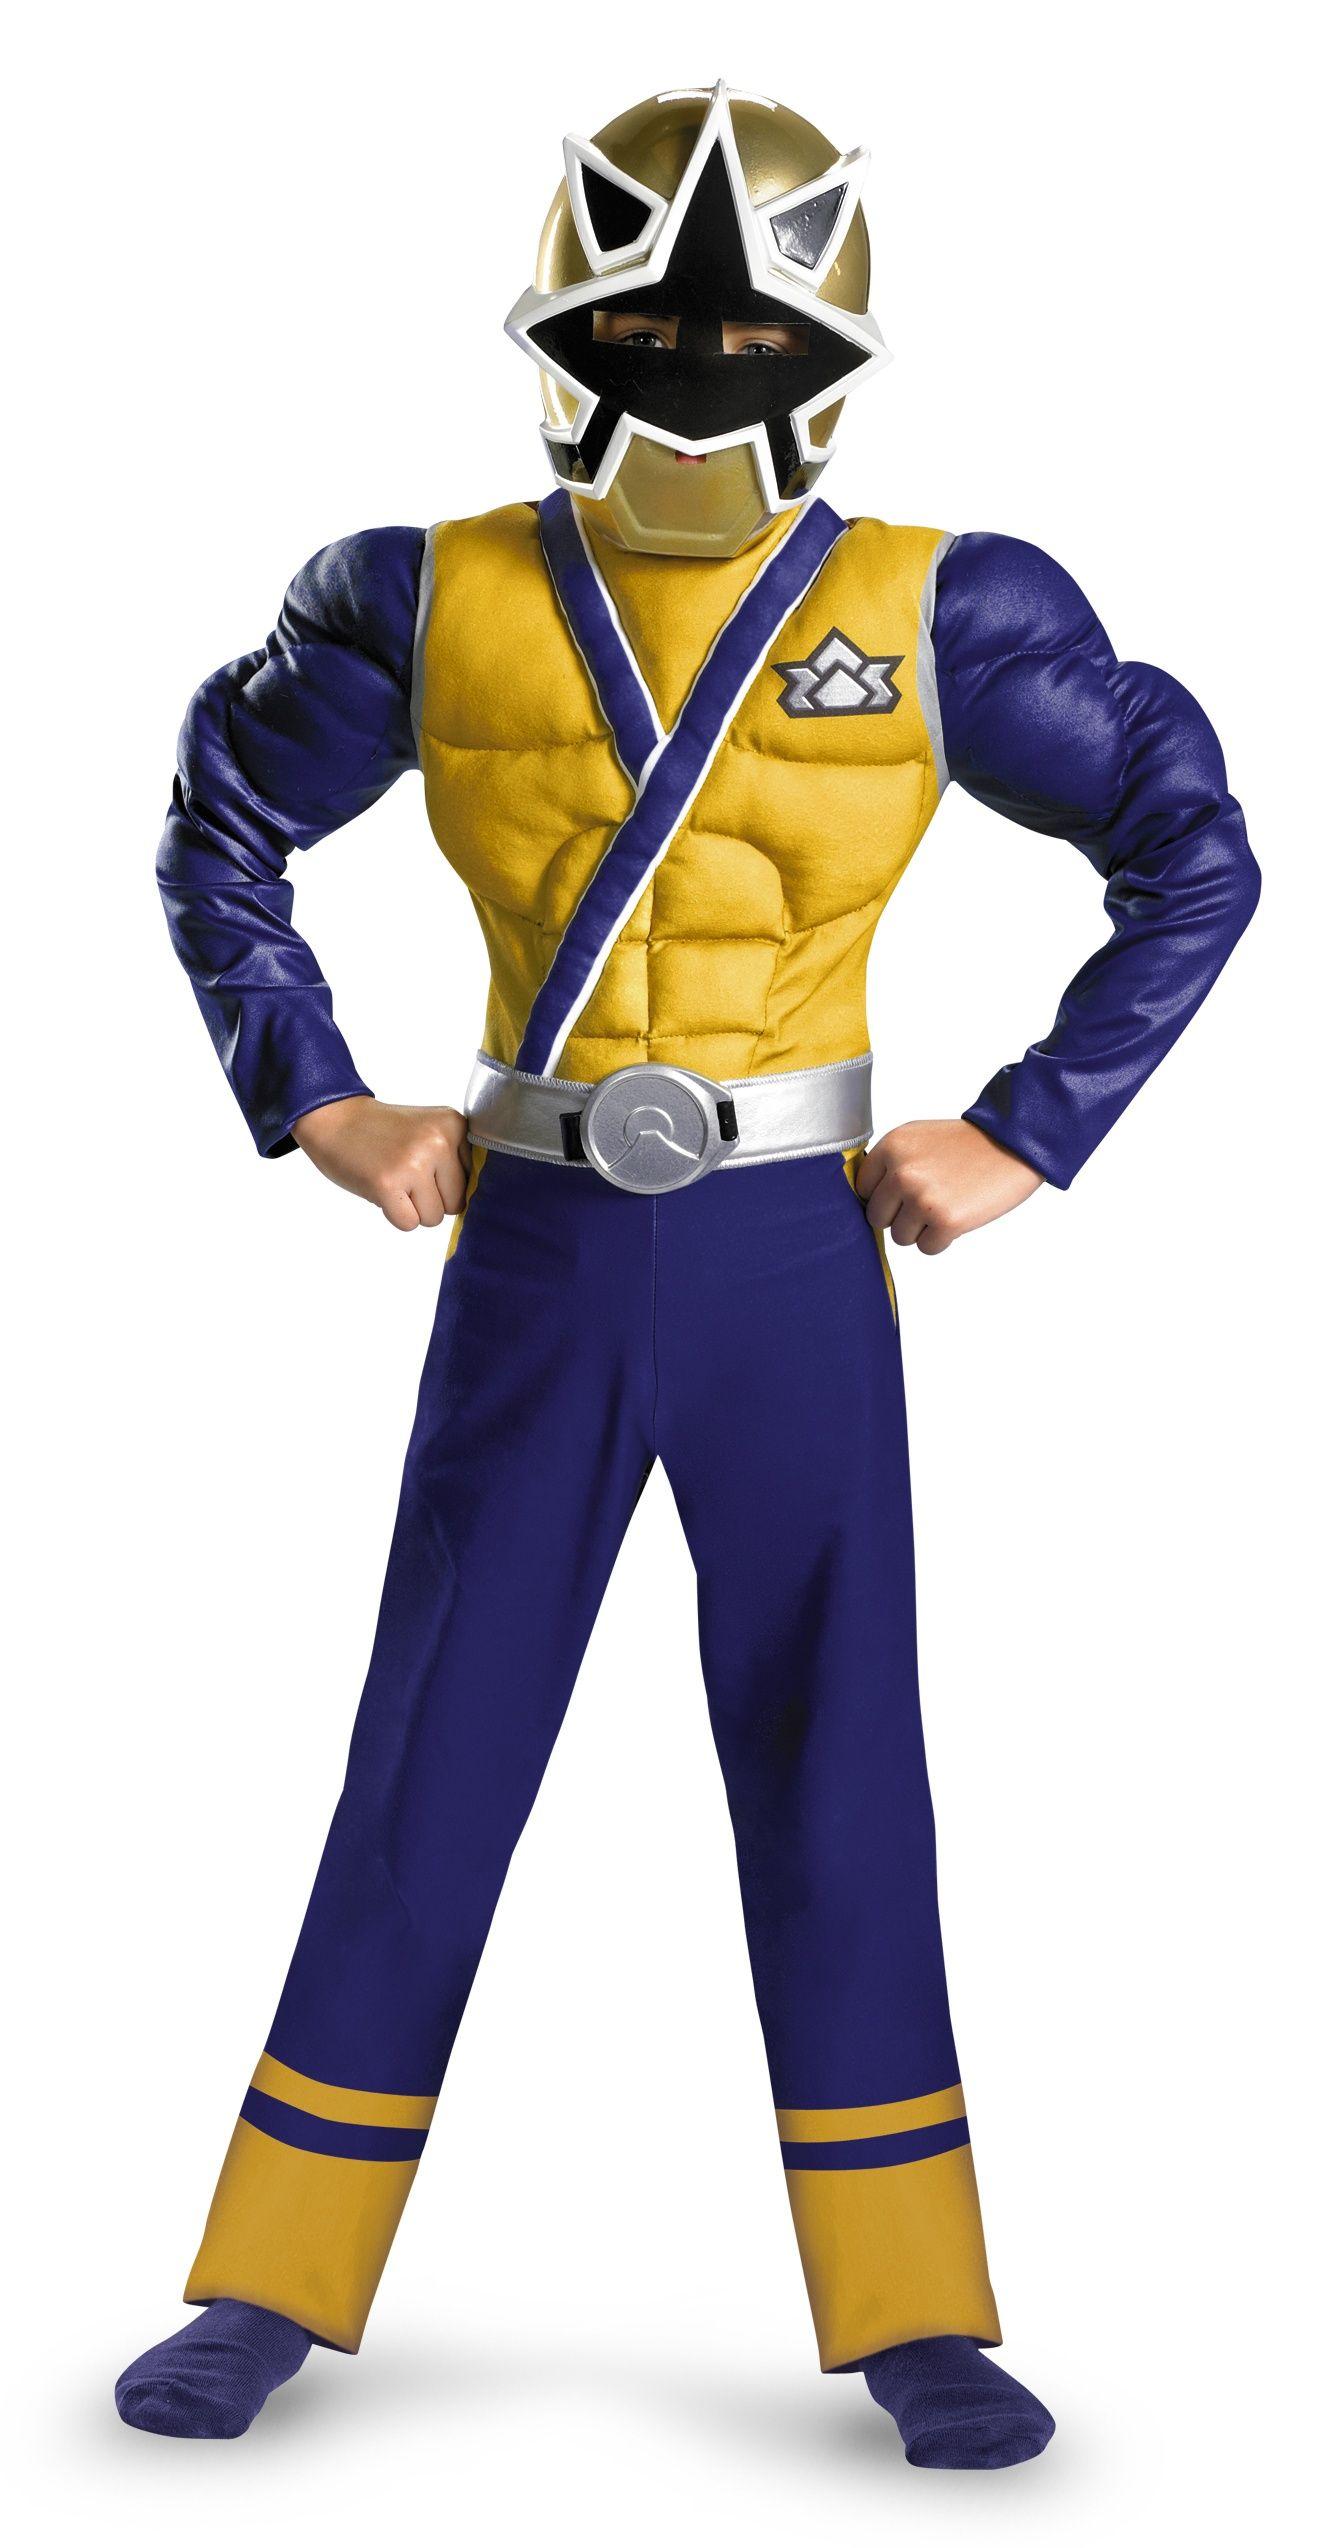 New Year Ranger Costume 72